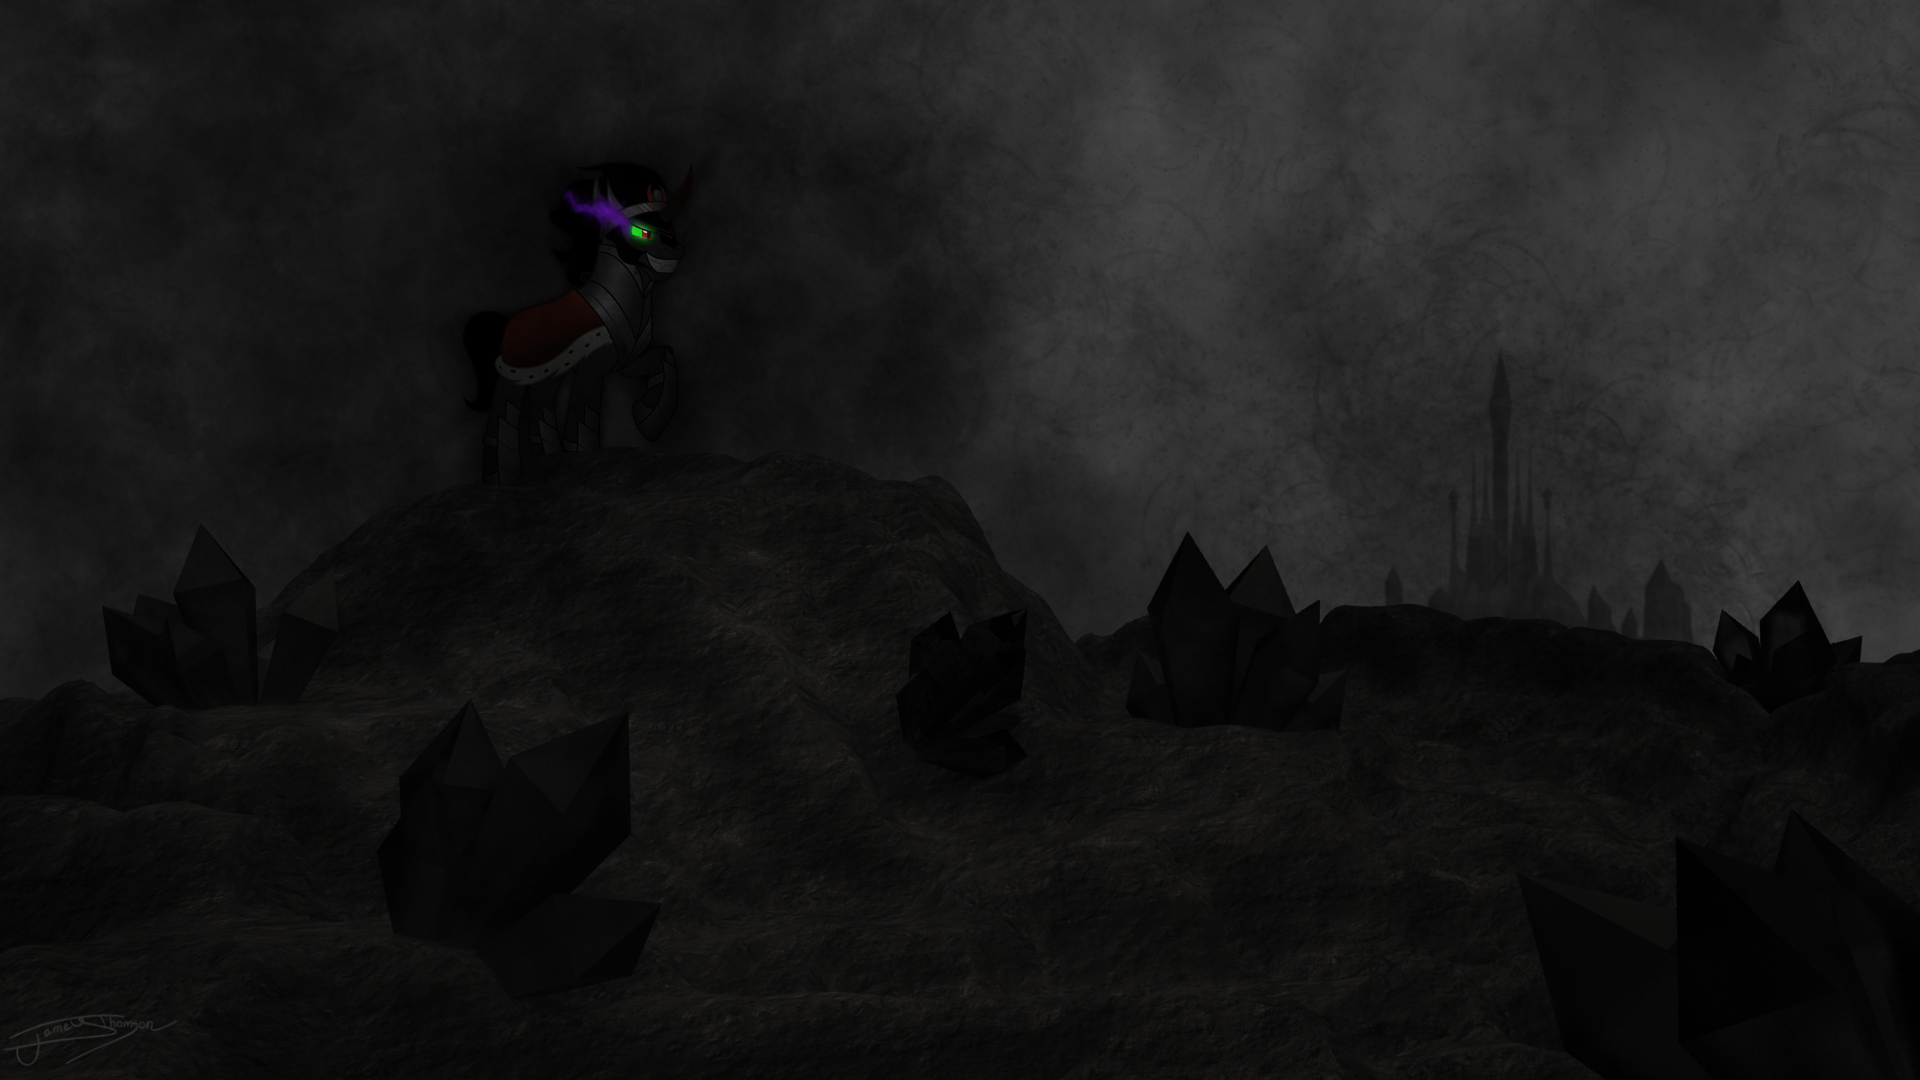 Enshrouding Darkness by Jamey4